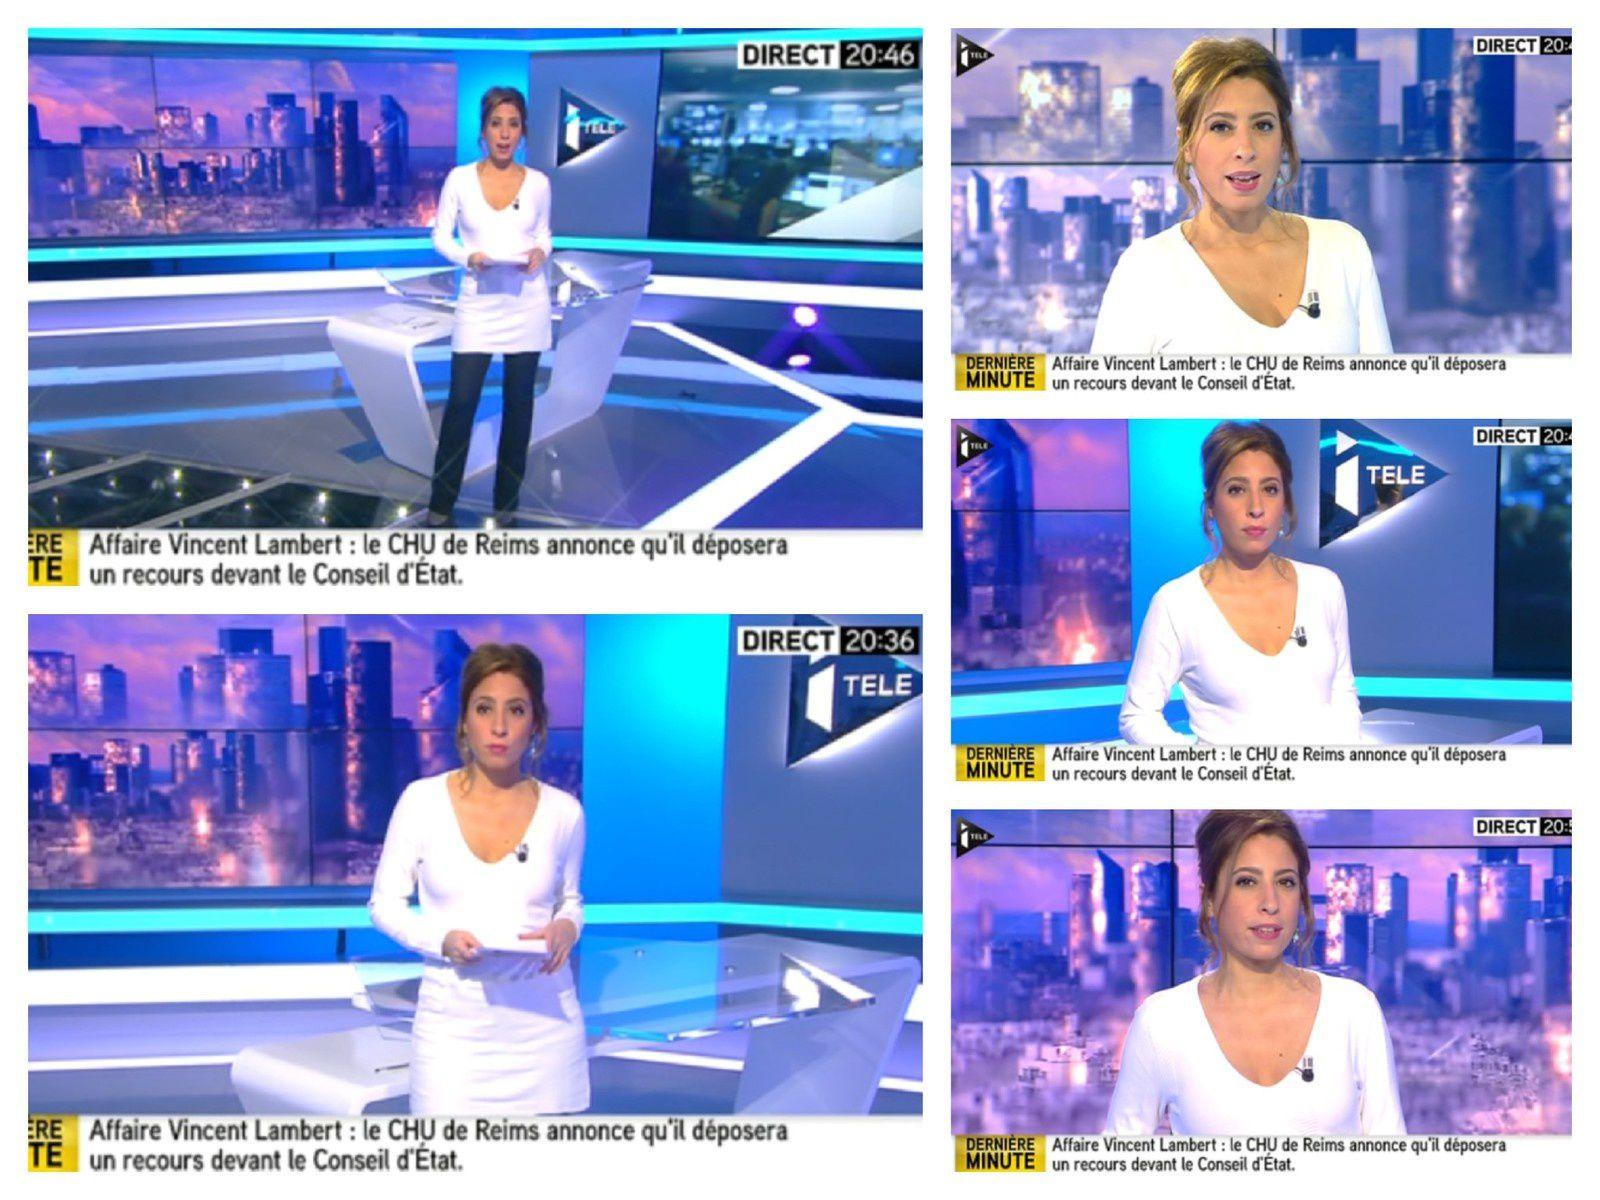 2014 01 29 - 20H30 - LEA SALAME - ITELE - 100% INFO